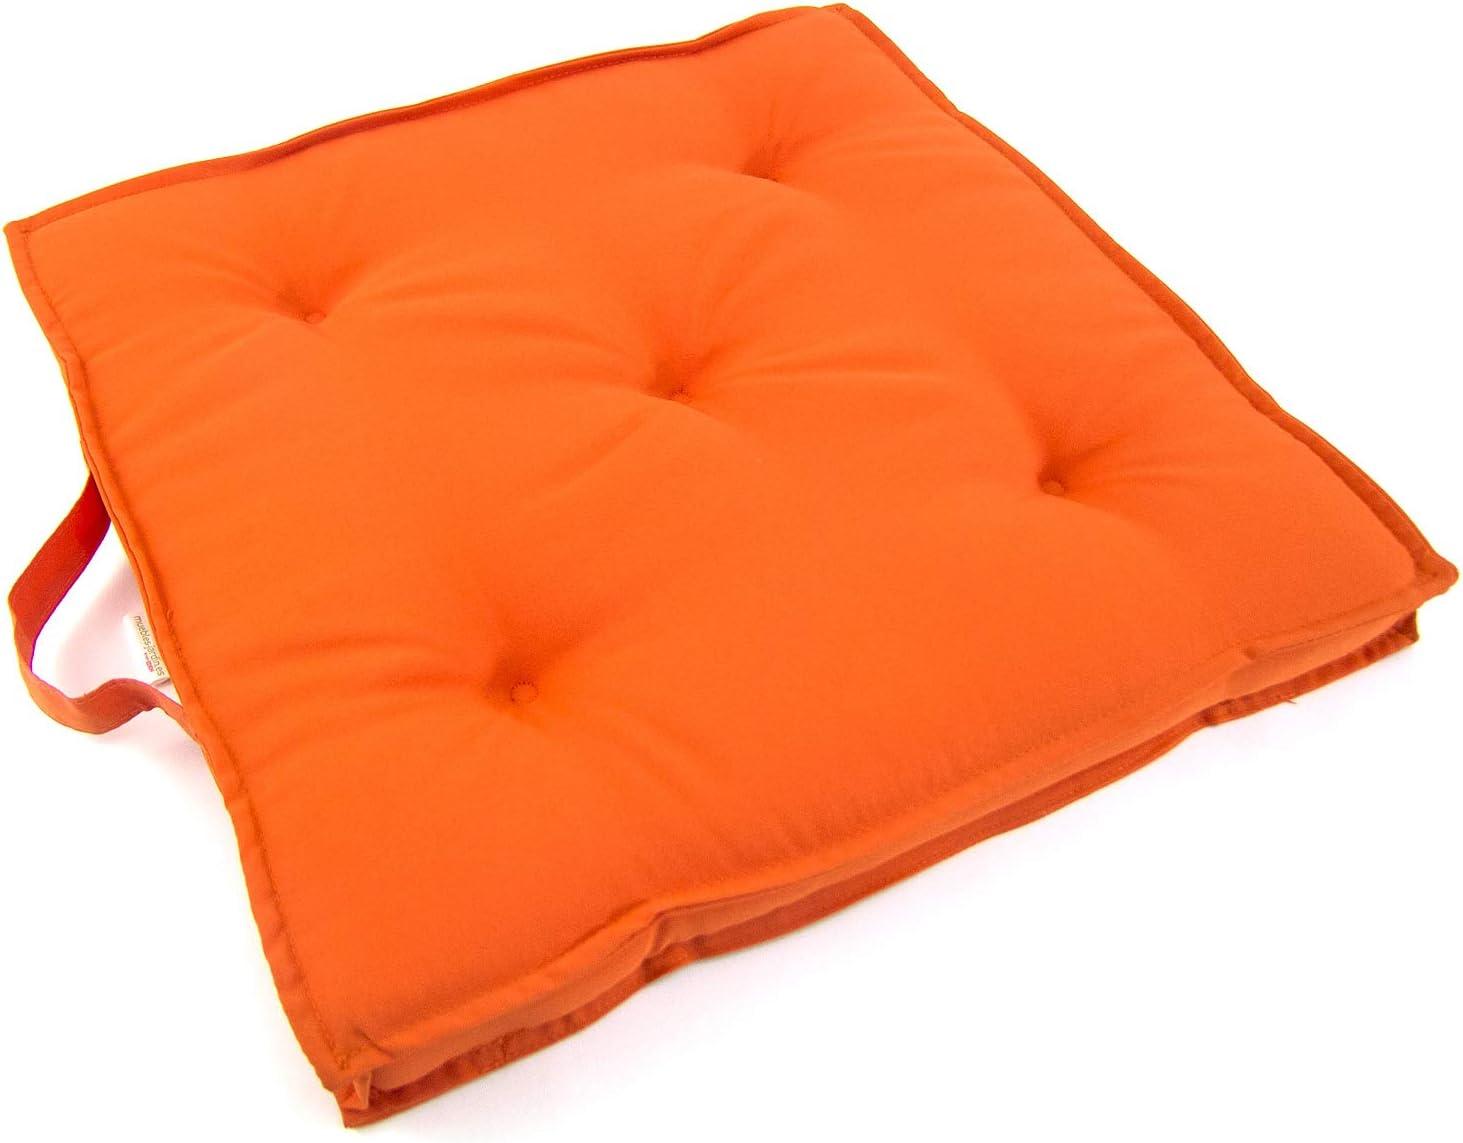 Repelente al Agua Tama/ño 42x42x5 cm Edenjardi Pack 2 Cojines para sillas de jard/ín Color Turquesa Desenfundable